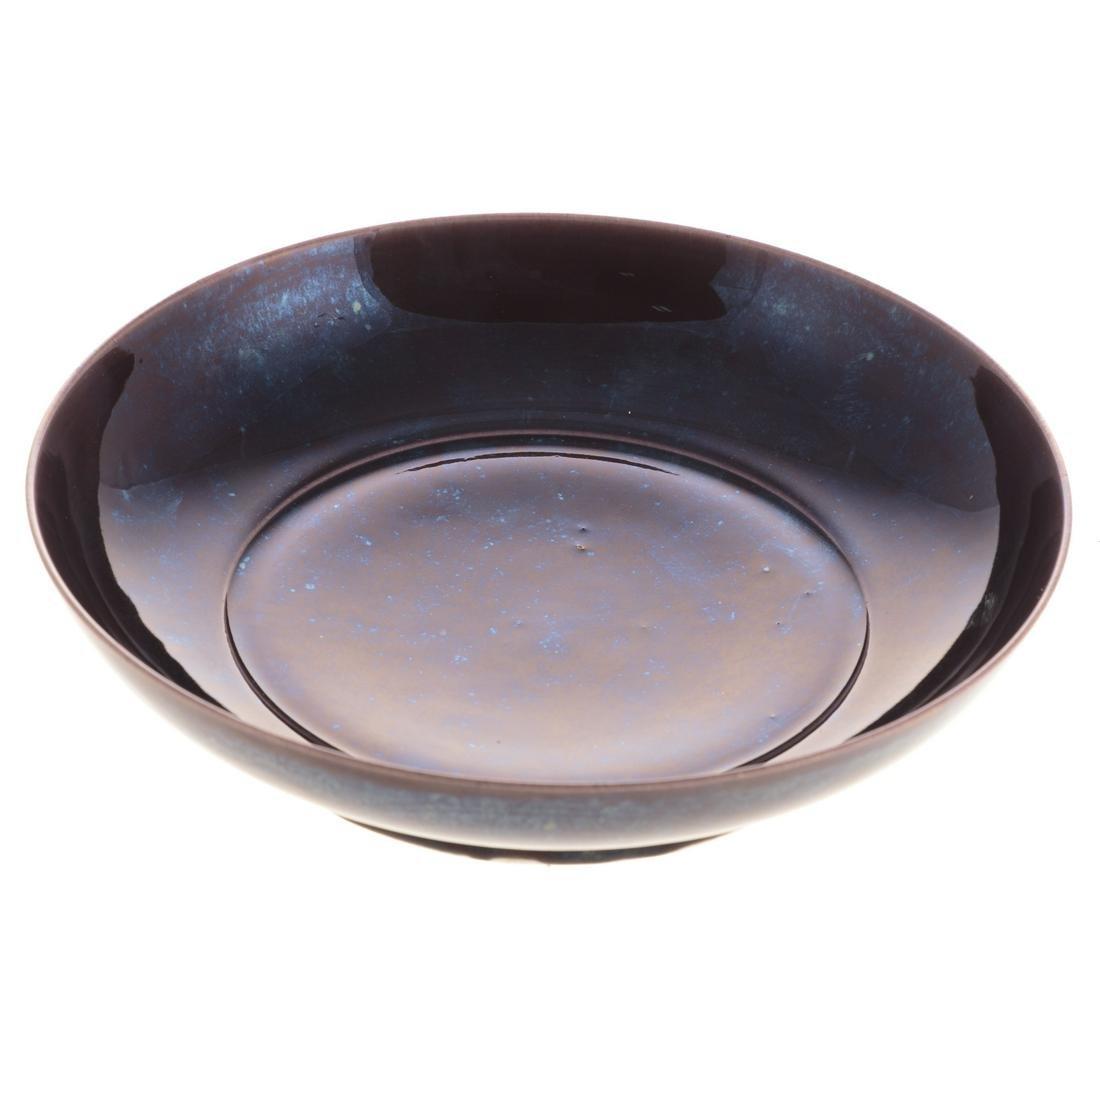 Chinese Aubergine Monochrome Porcelain Bowl